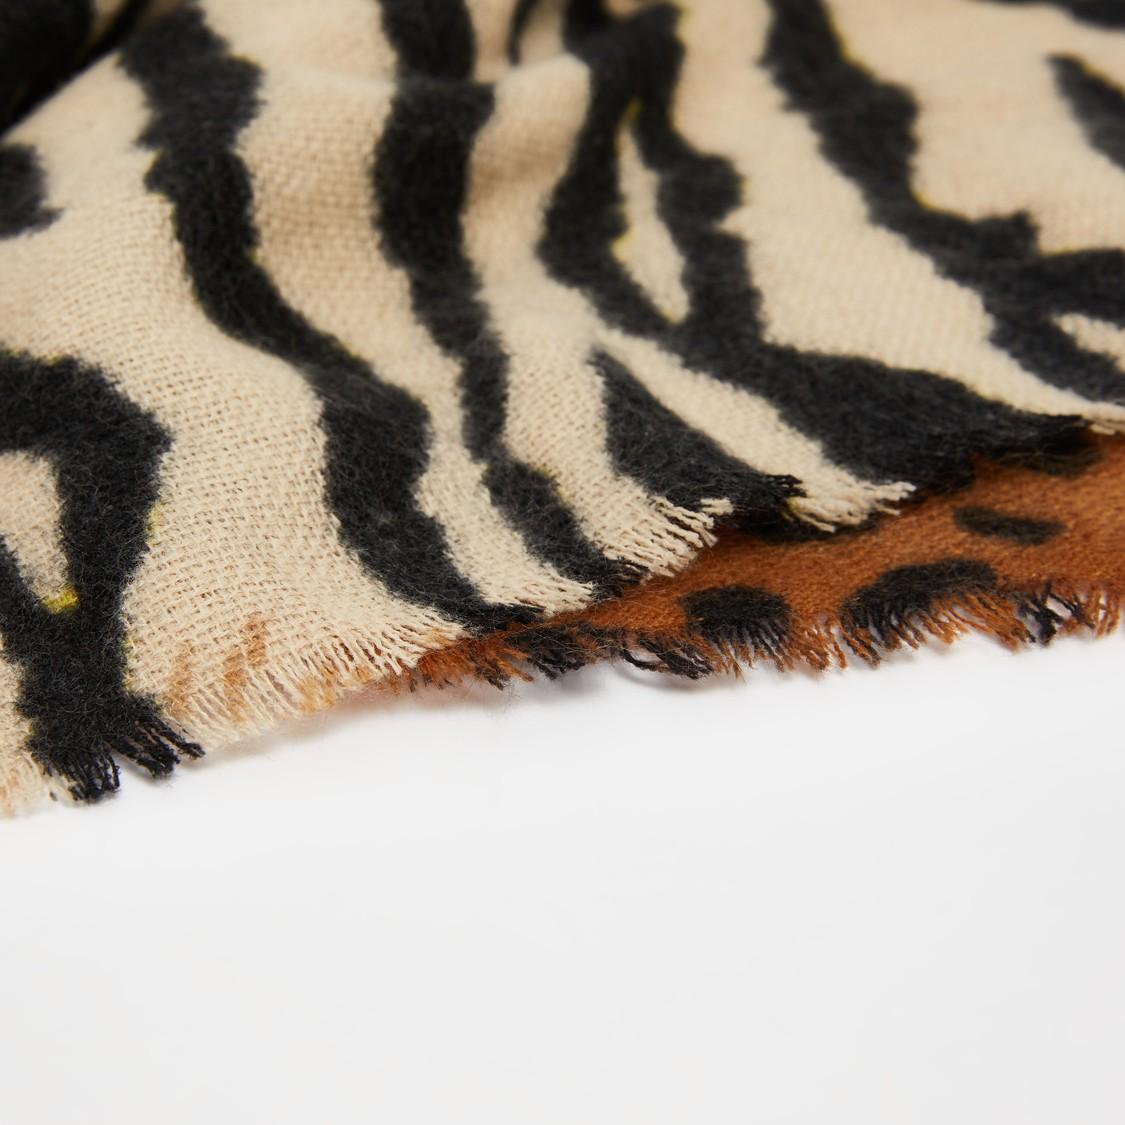 Animal Print Scarf with Fringe Detail